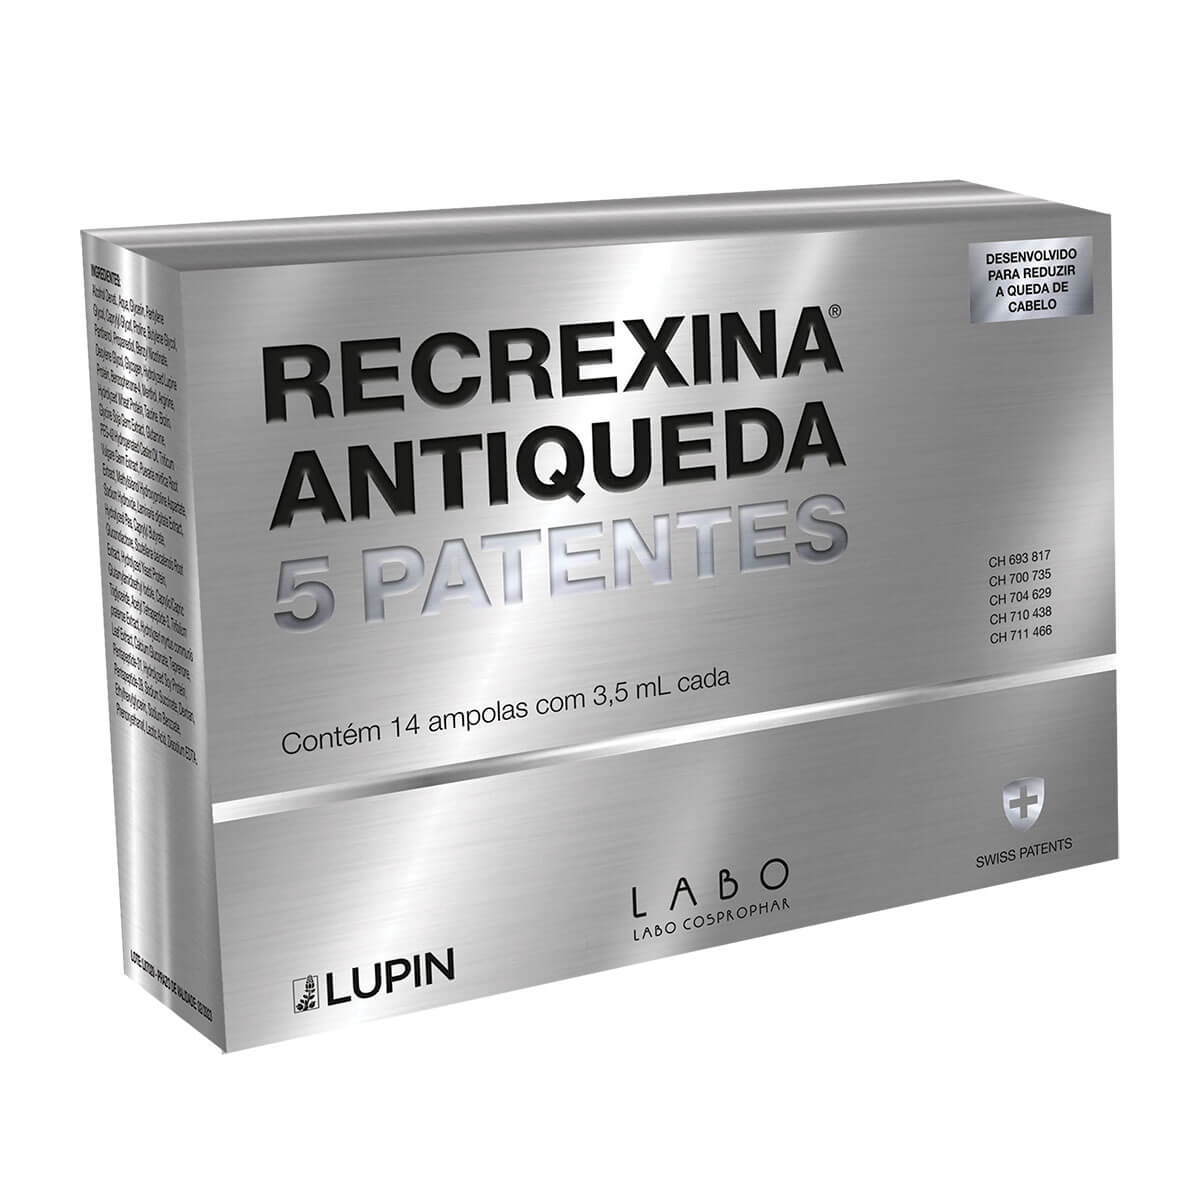 Recrexina Antiqueda 5 Patentes Lupin 14 Ampolas